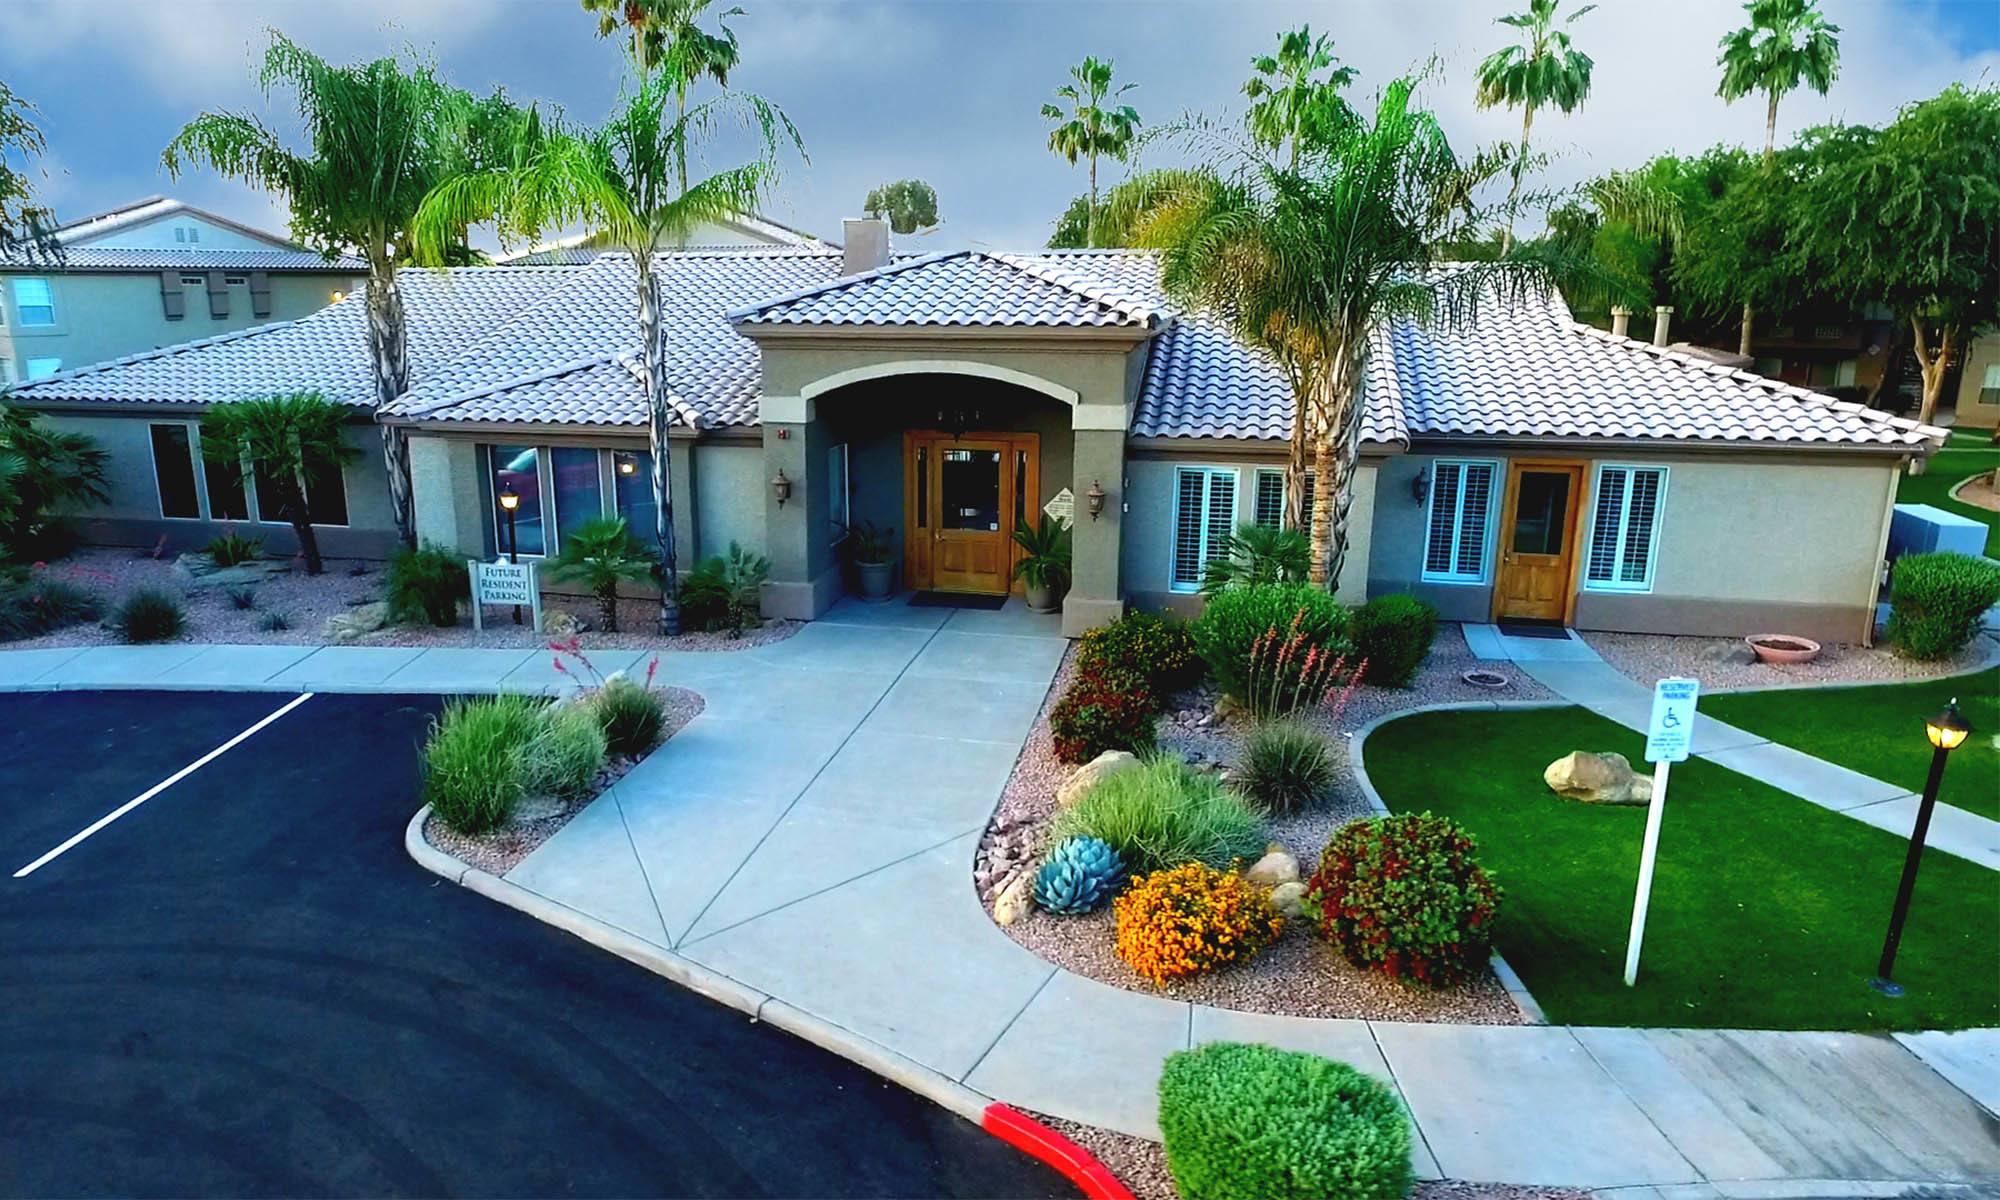 Ocotillo Bay Apartments in Chandler, Arizona